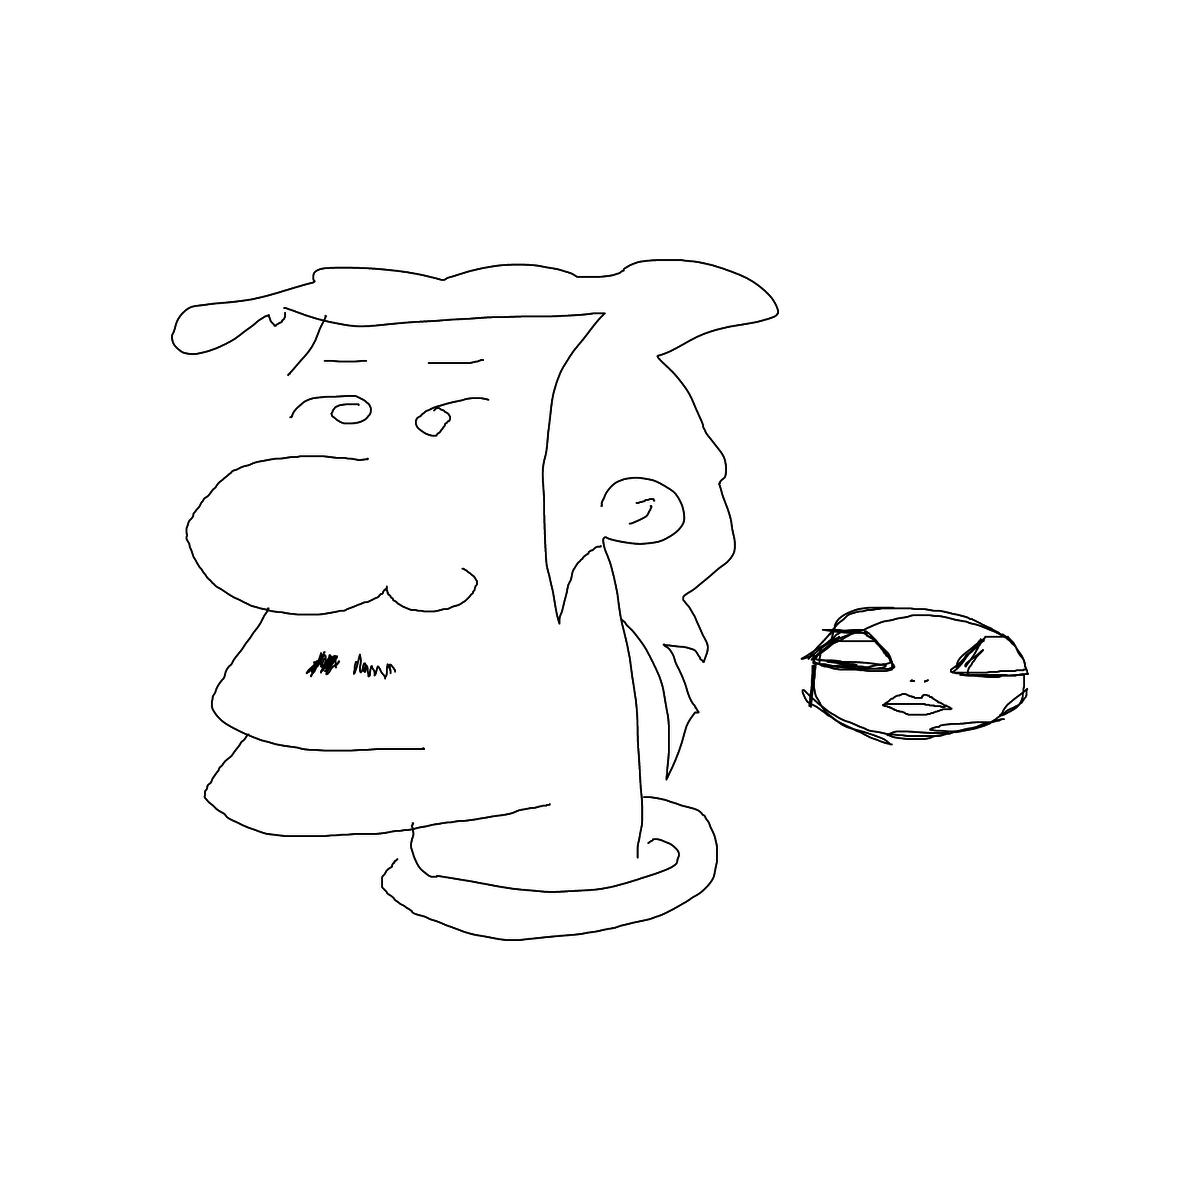 BAAAM drawing#17398 lat:45.9769020080566400lng: 12.6495103836059570